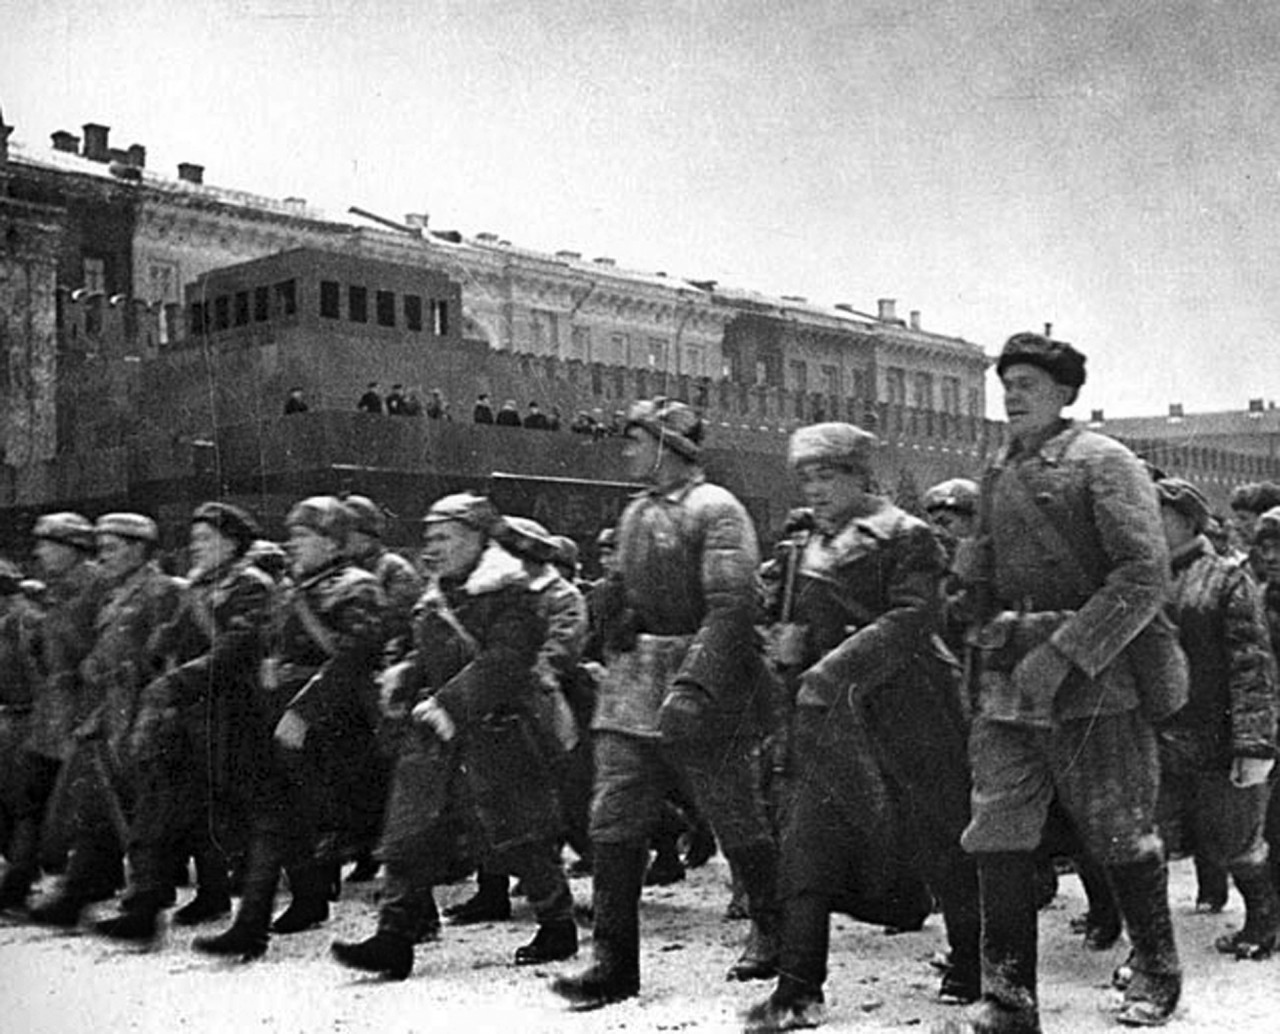 камуй: Парад 7 ноября 1941 года на Красной площади